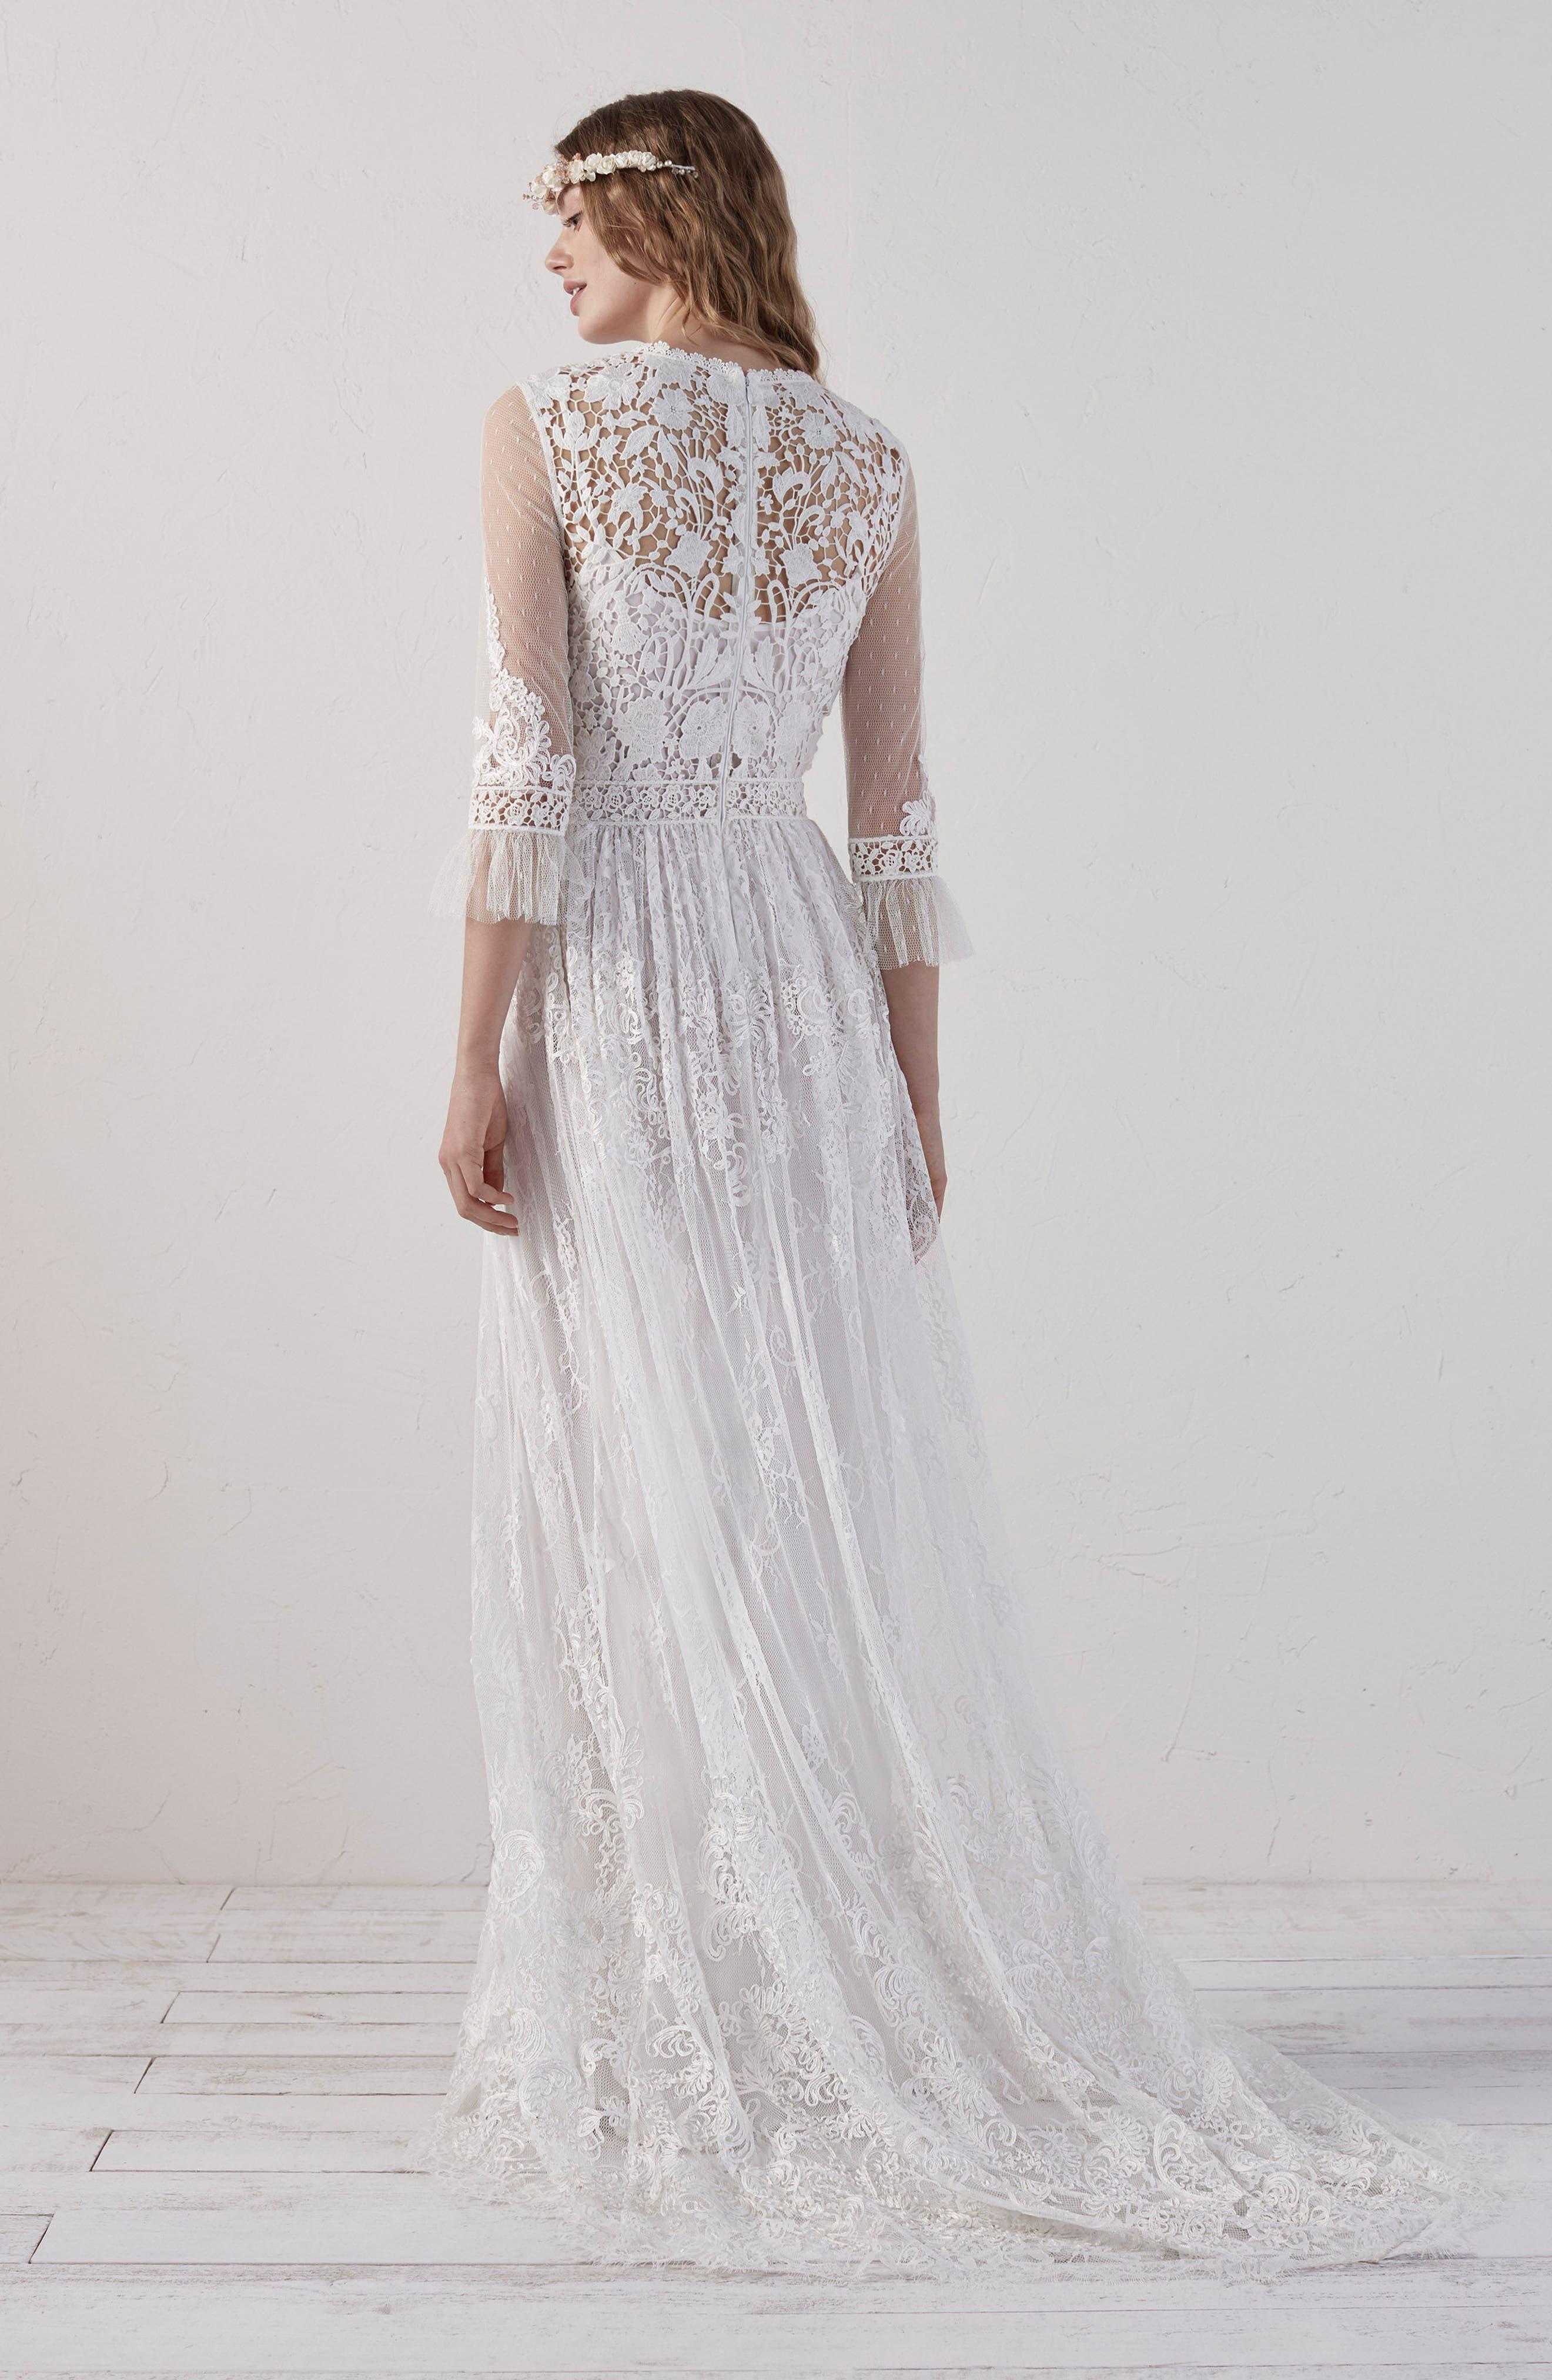 Edet Boho Lace Gown,                             Alternate thumbnail 2, color,                             OFF WHITE